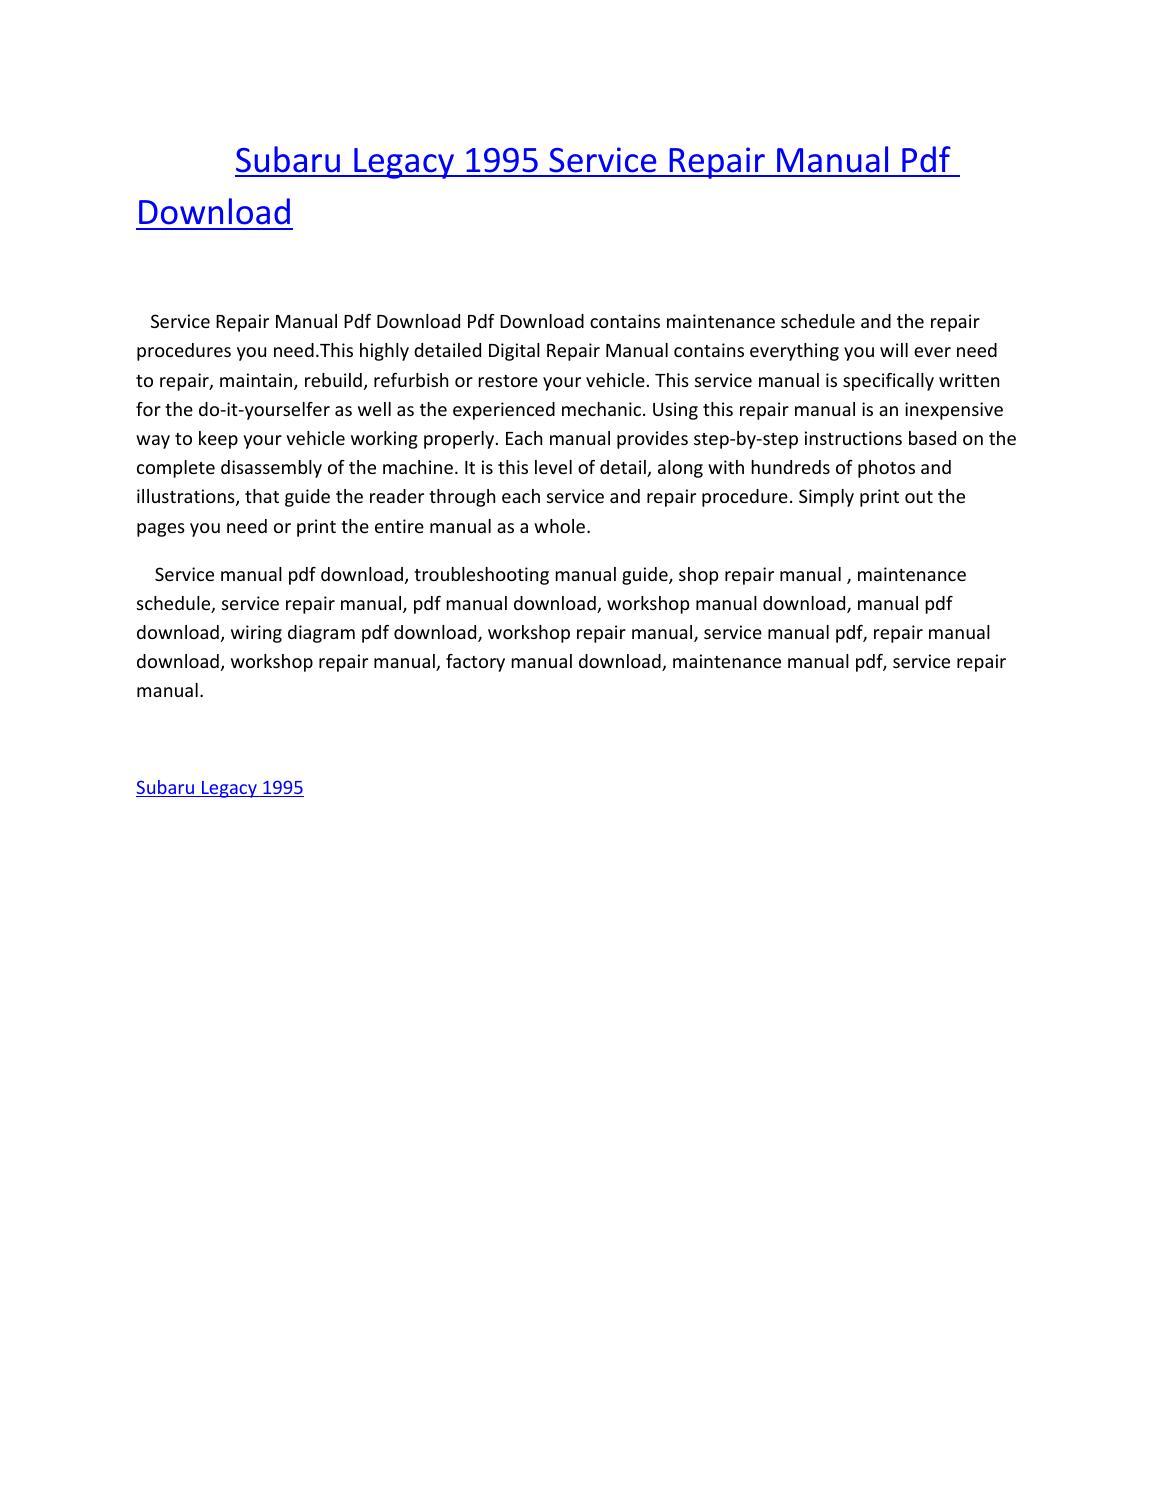 Subaru legacy 1995 service repair manual pdf download by amurgului - issuu